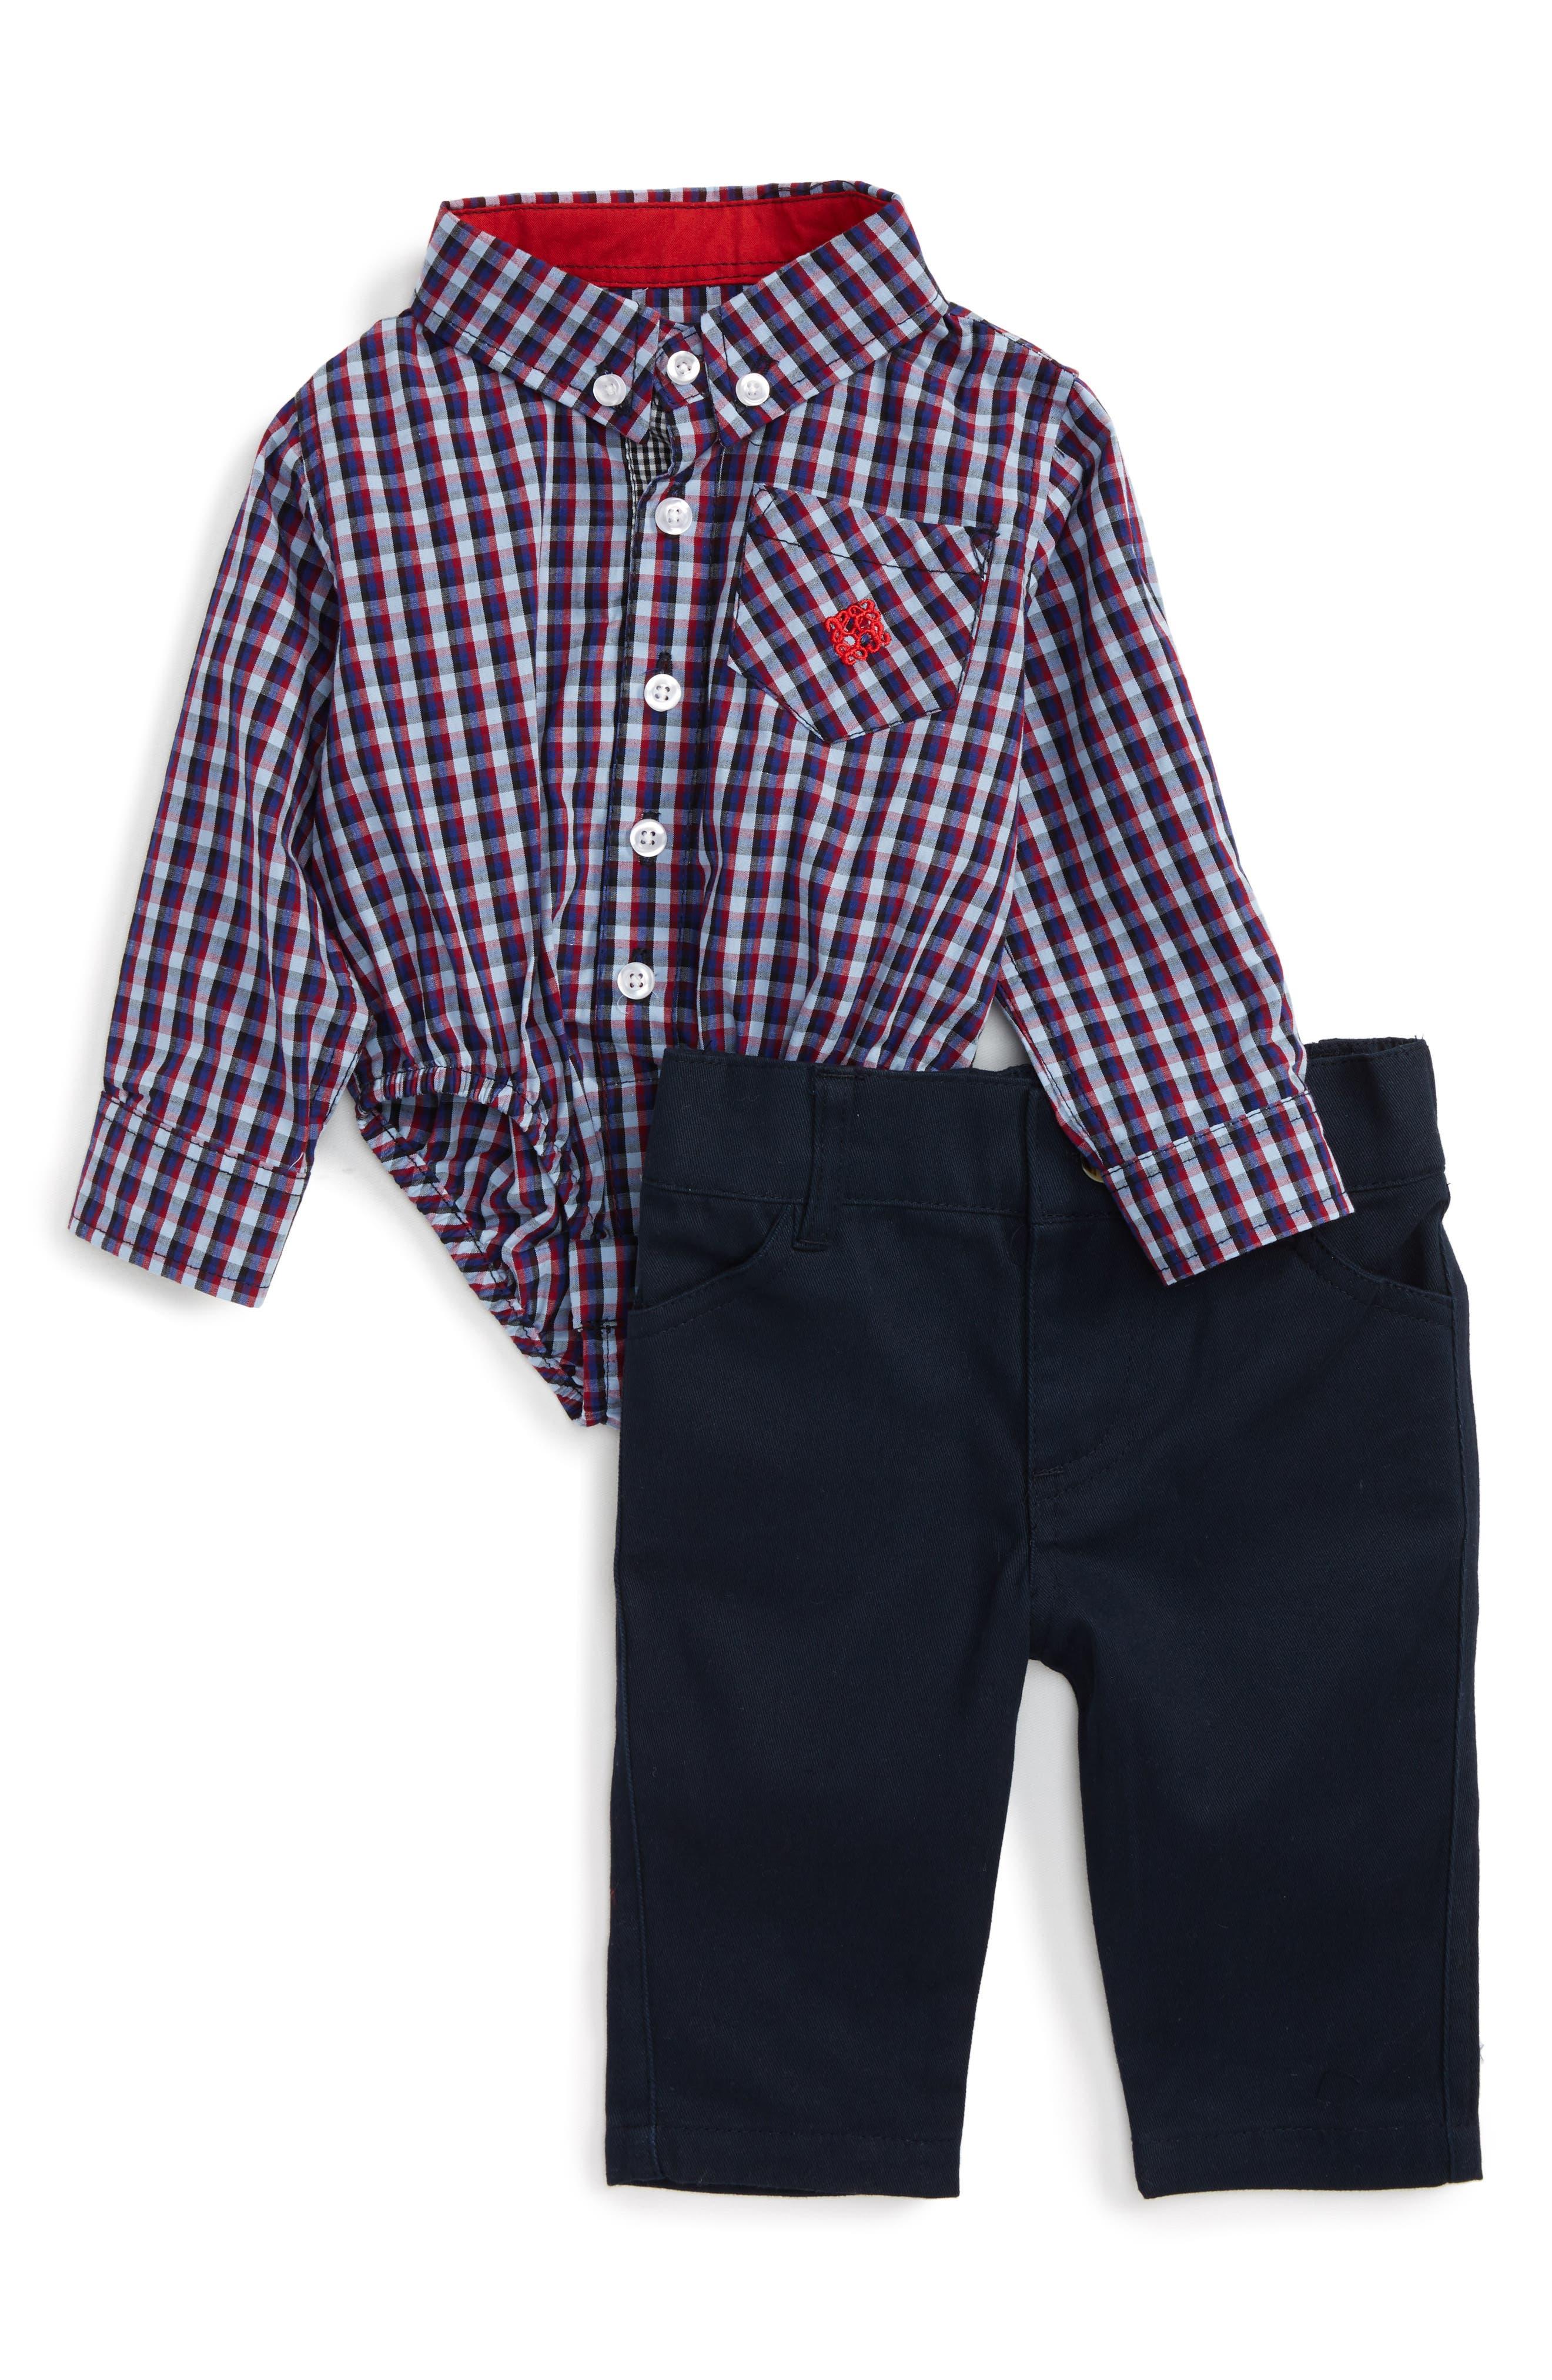 Main Image - Andy & Evan Shirtzie Check Bodysuit & Pants Set (Baby Boys)